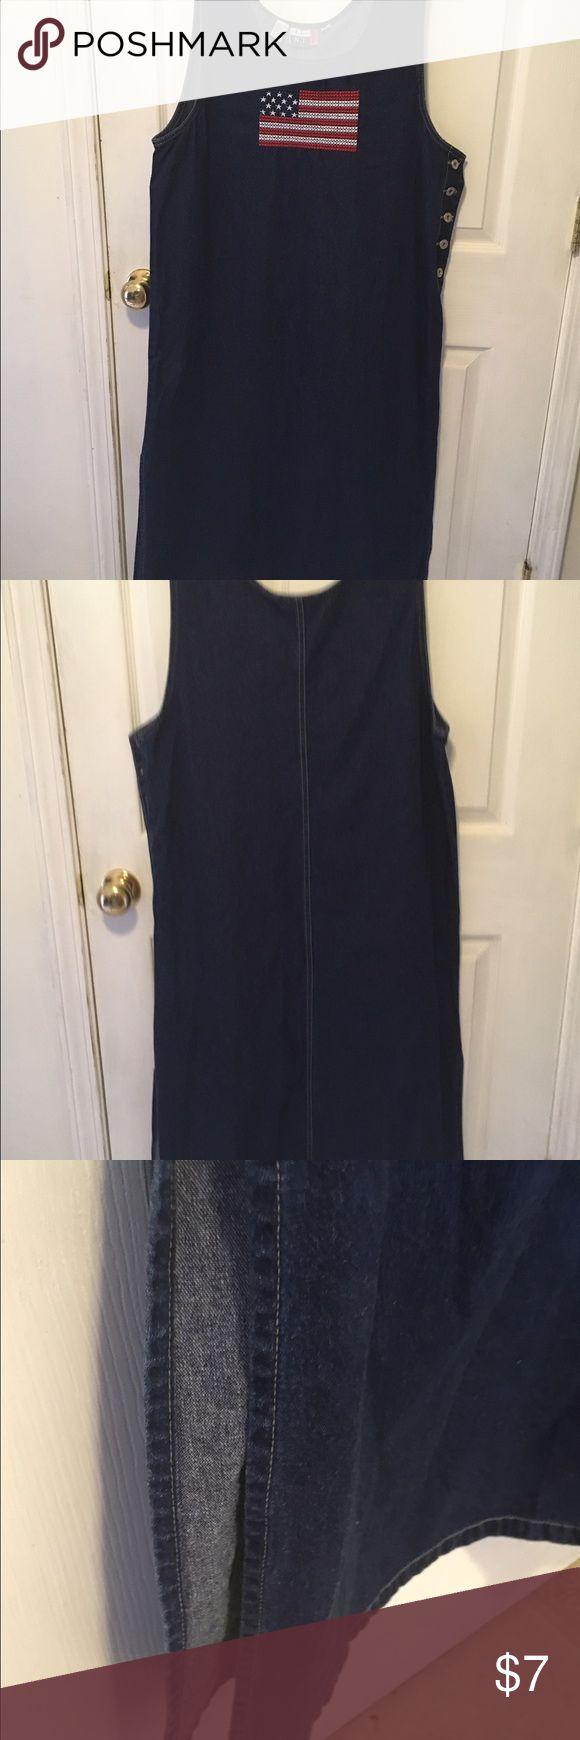 Blue denim dress Blue denim dress with side splits Dresses